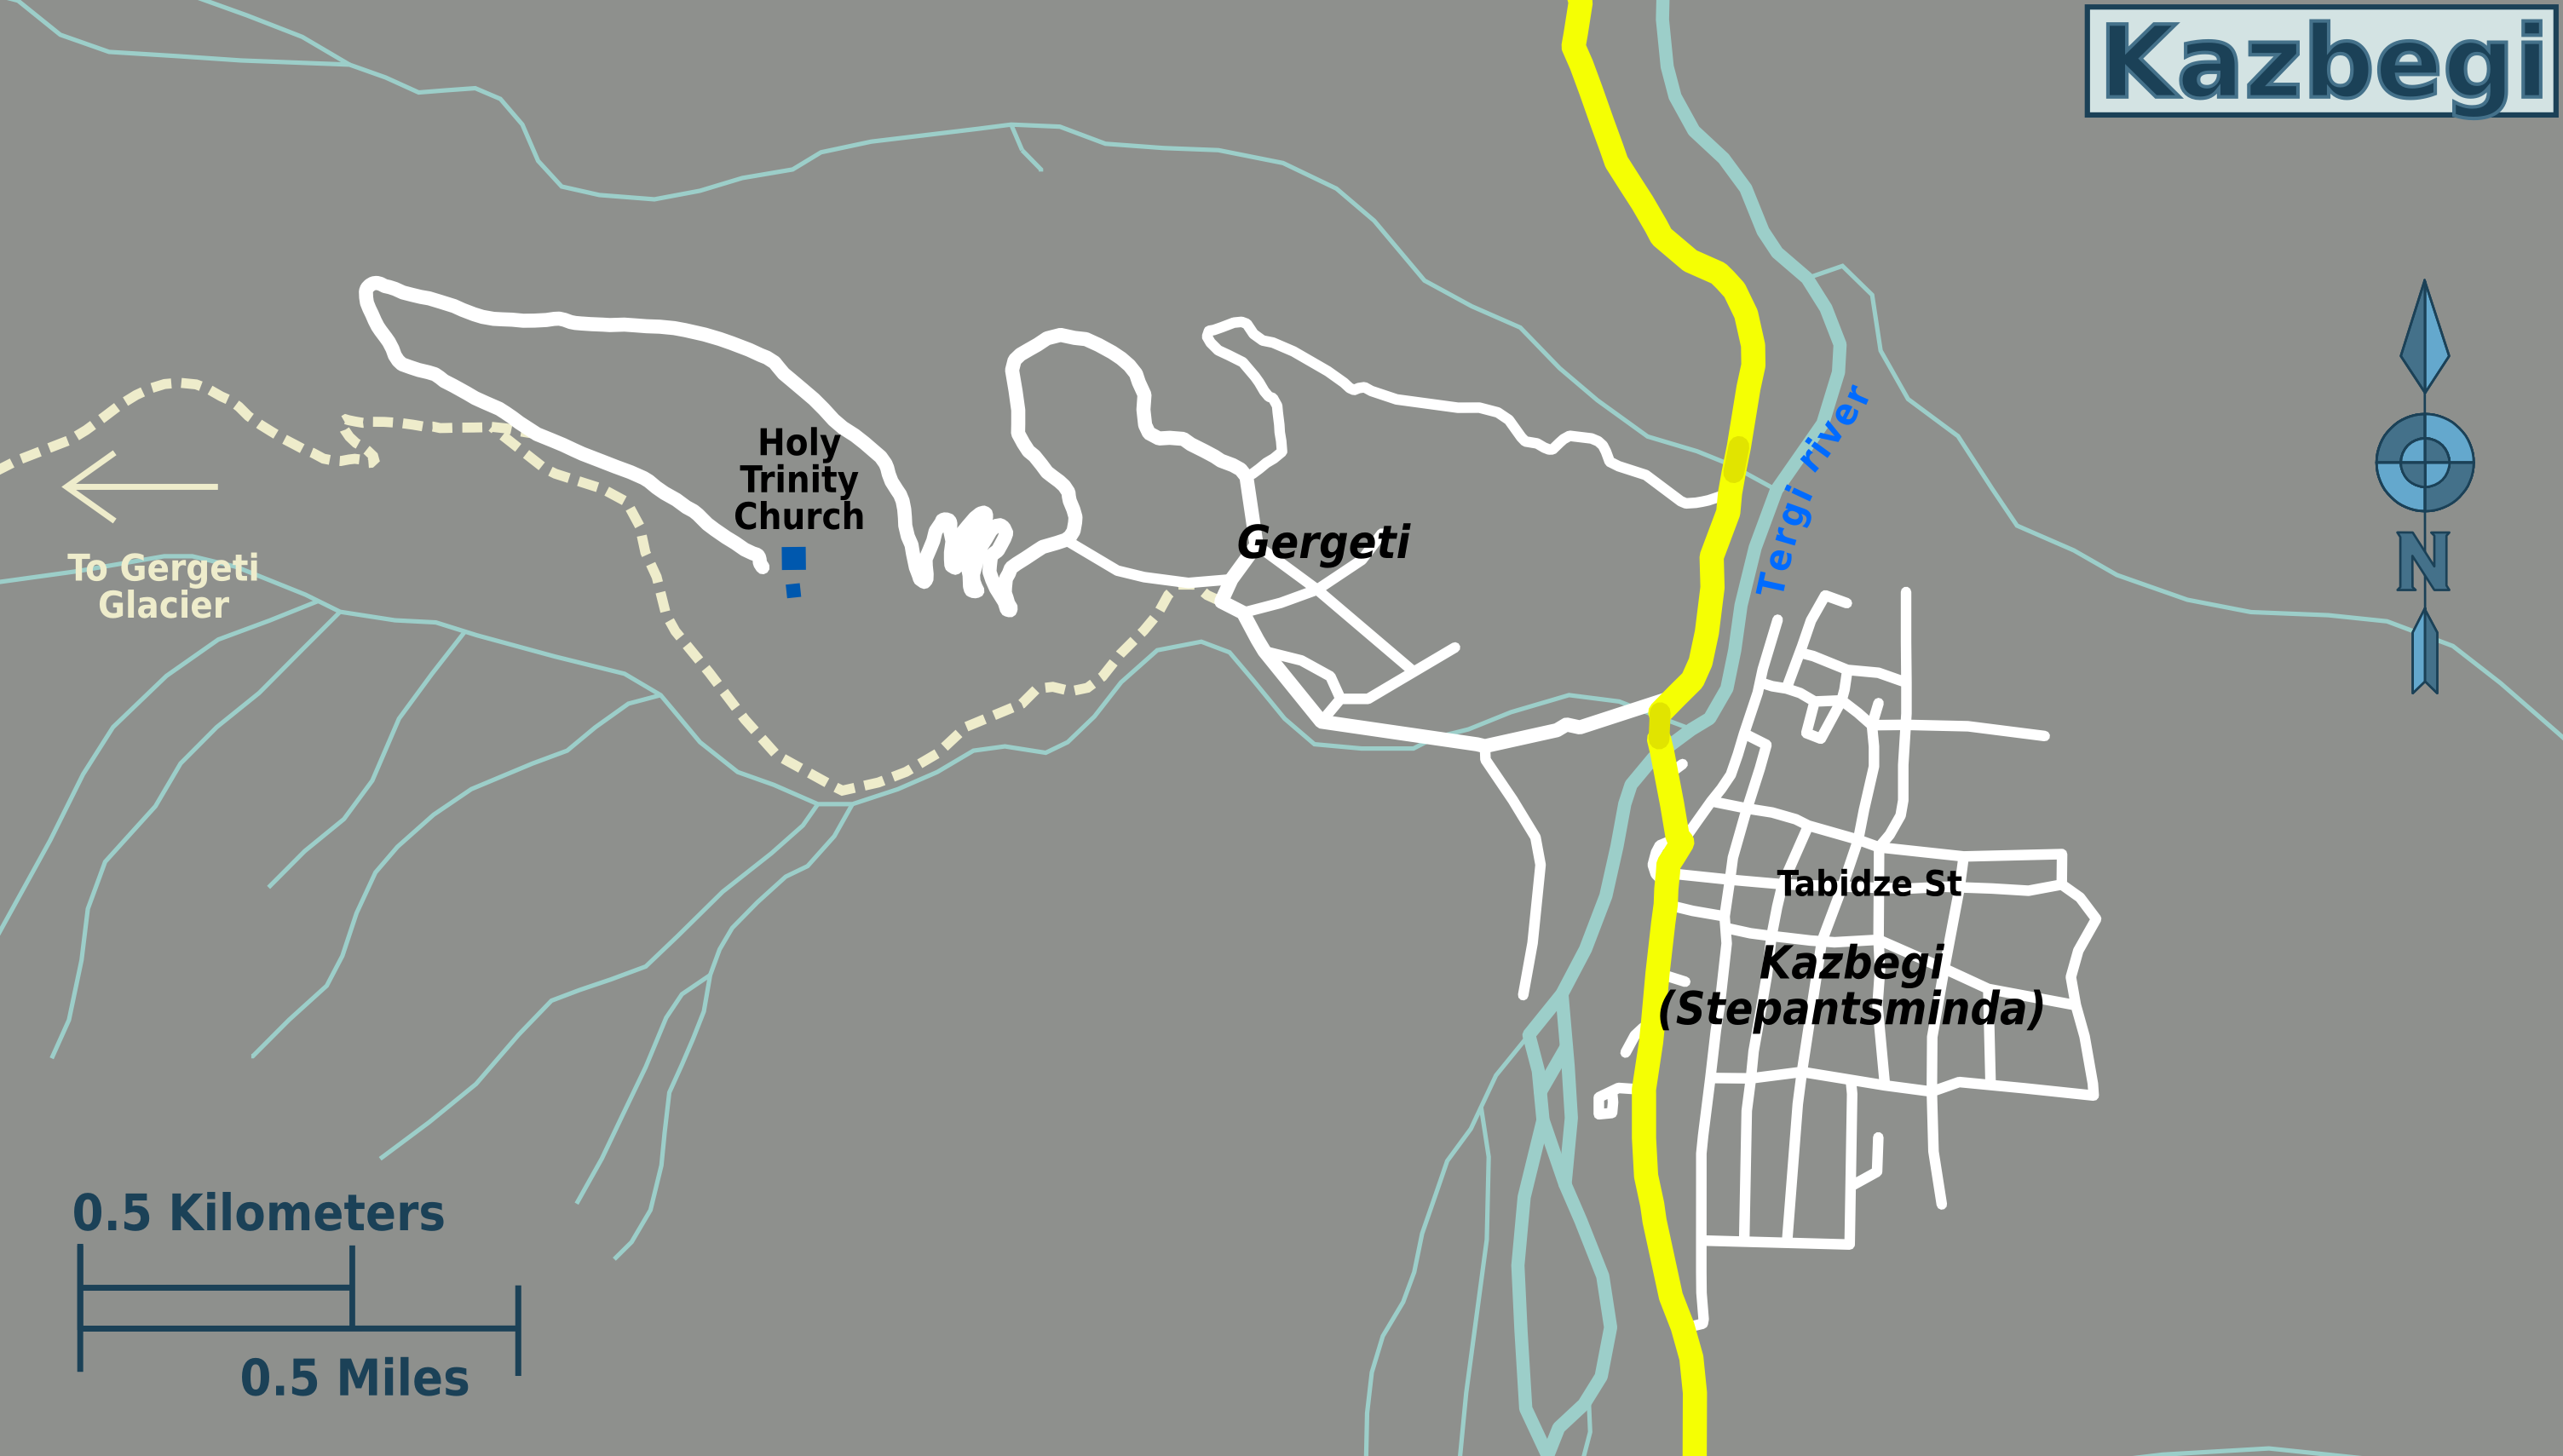 Kazbegi_map by wikitravel